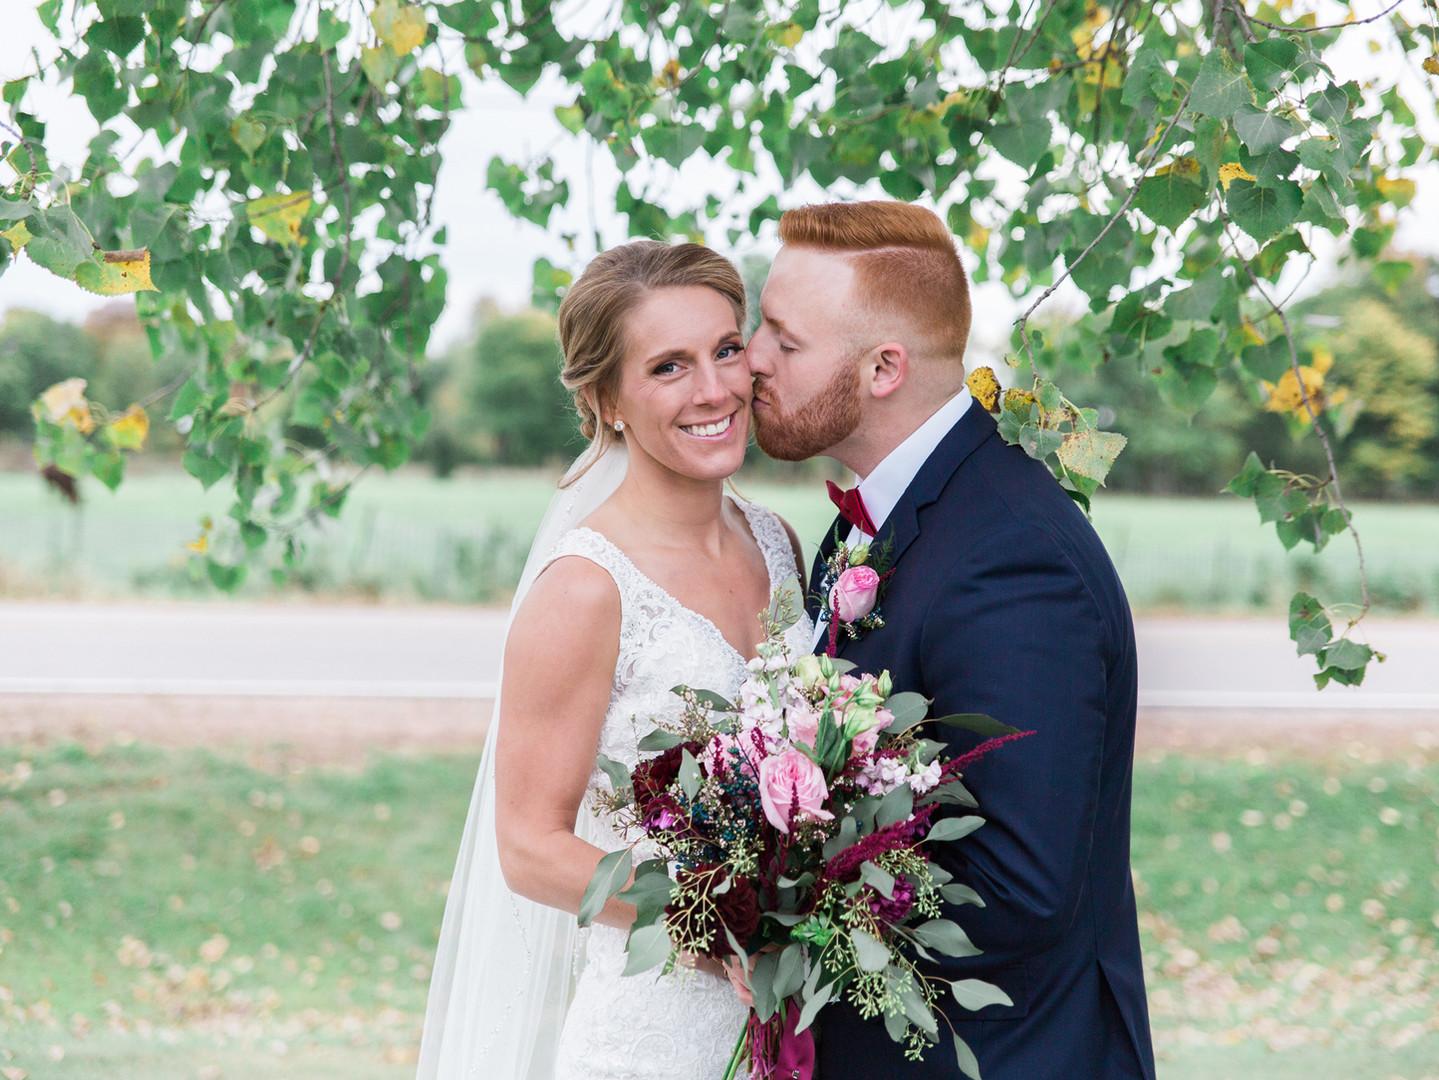 Kayla-Chris-Wedding-2018-377.jpg